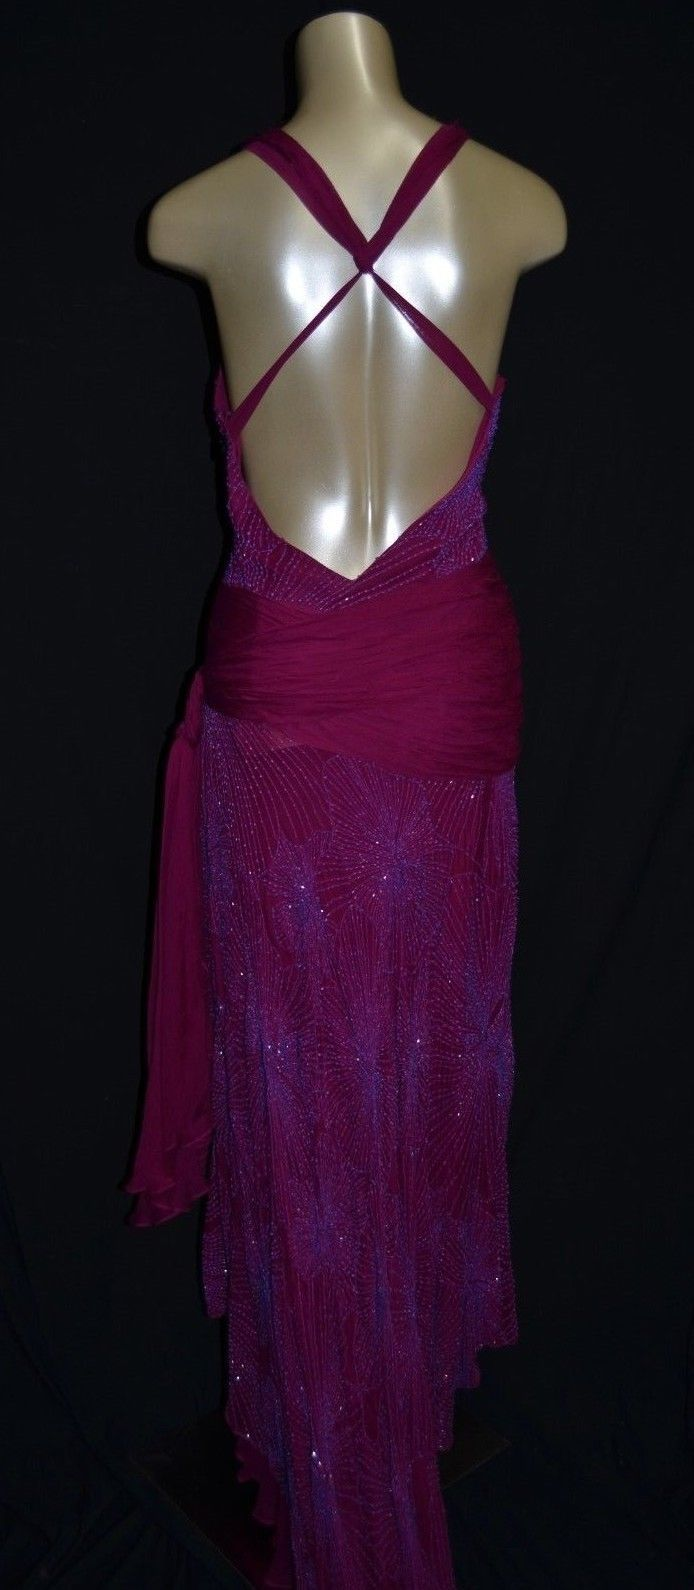 BCBG Max Azaria ATELIER  open back beaded gown dress plumb (A6)